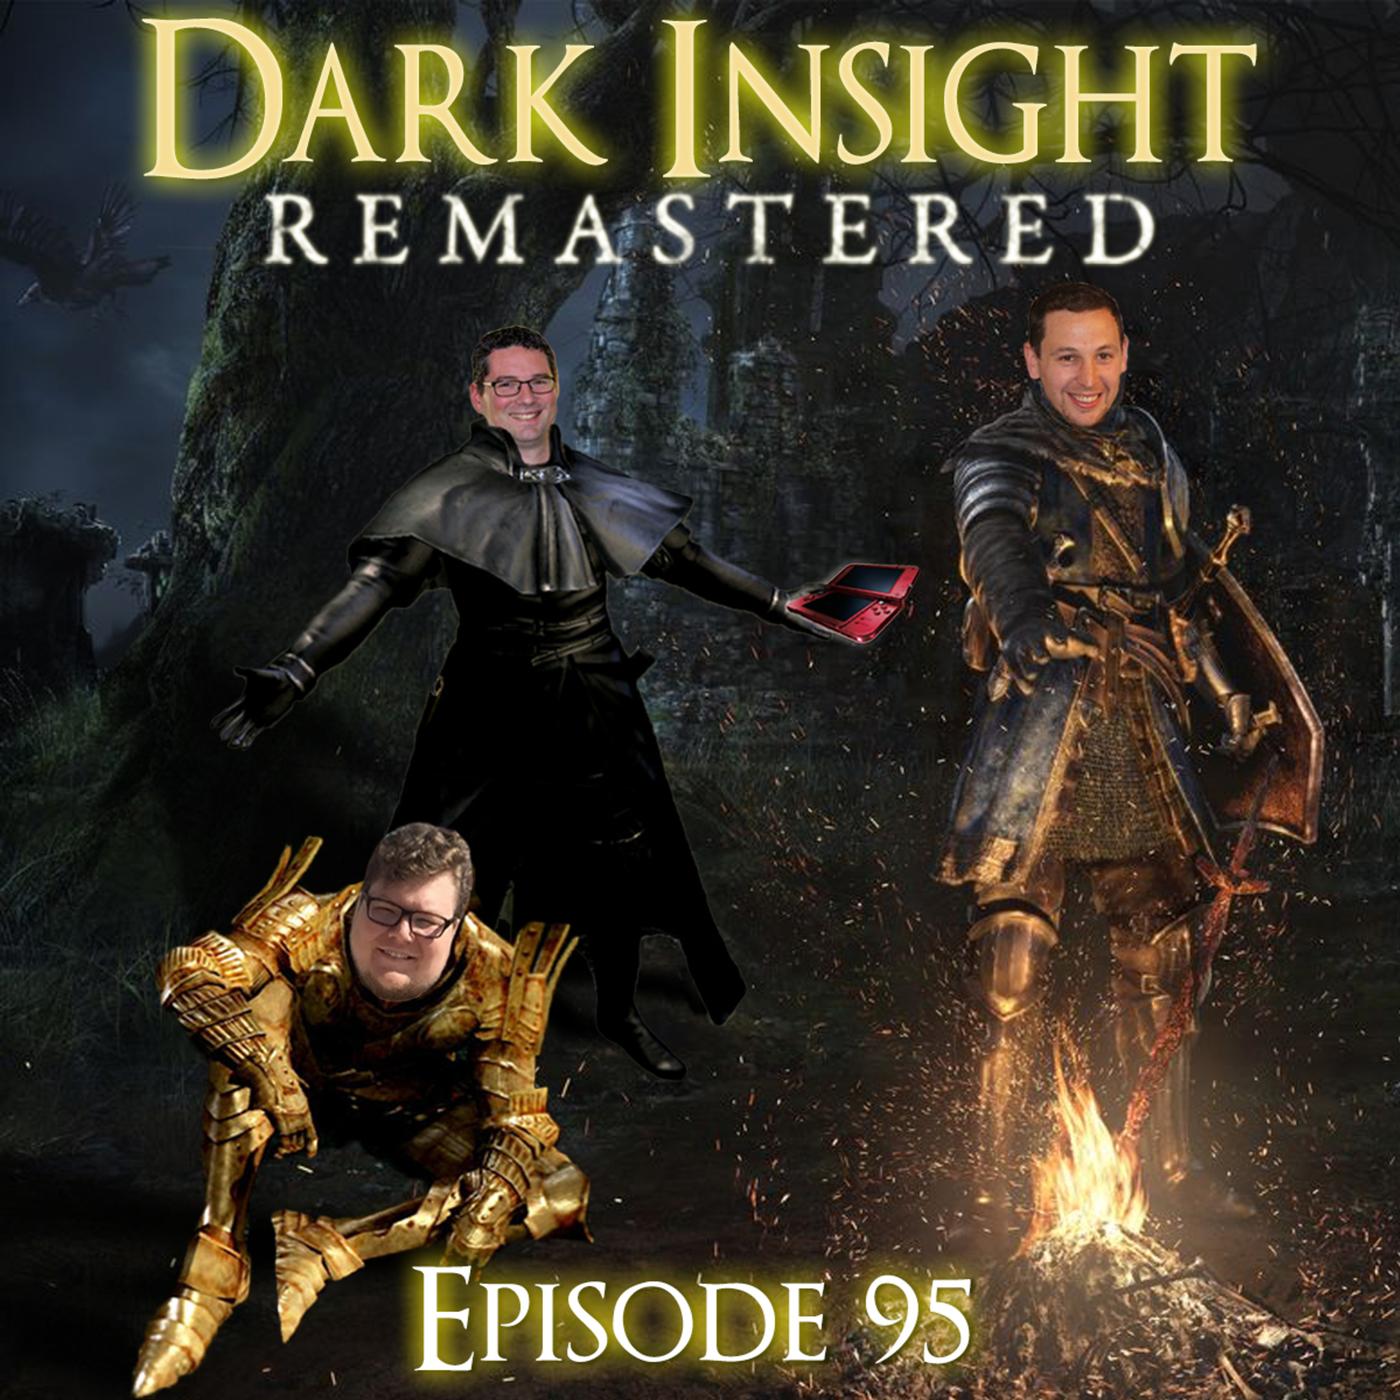 Dark Insight Episode 95: Dark Insight Remastered